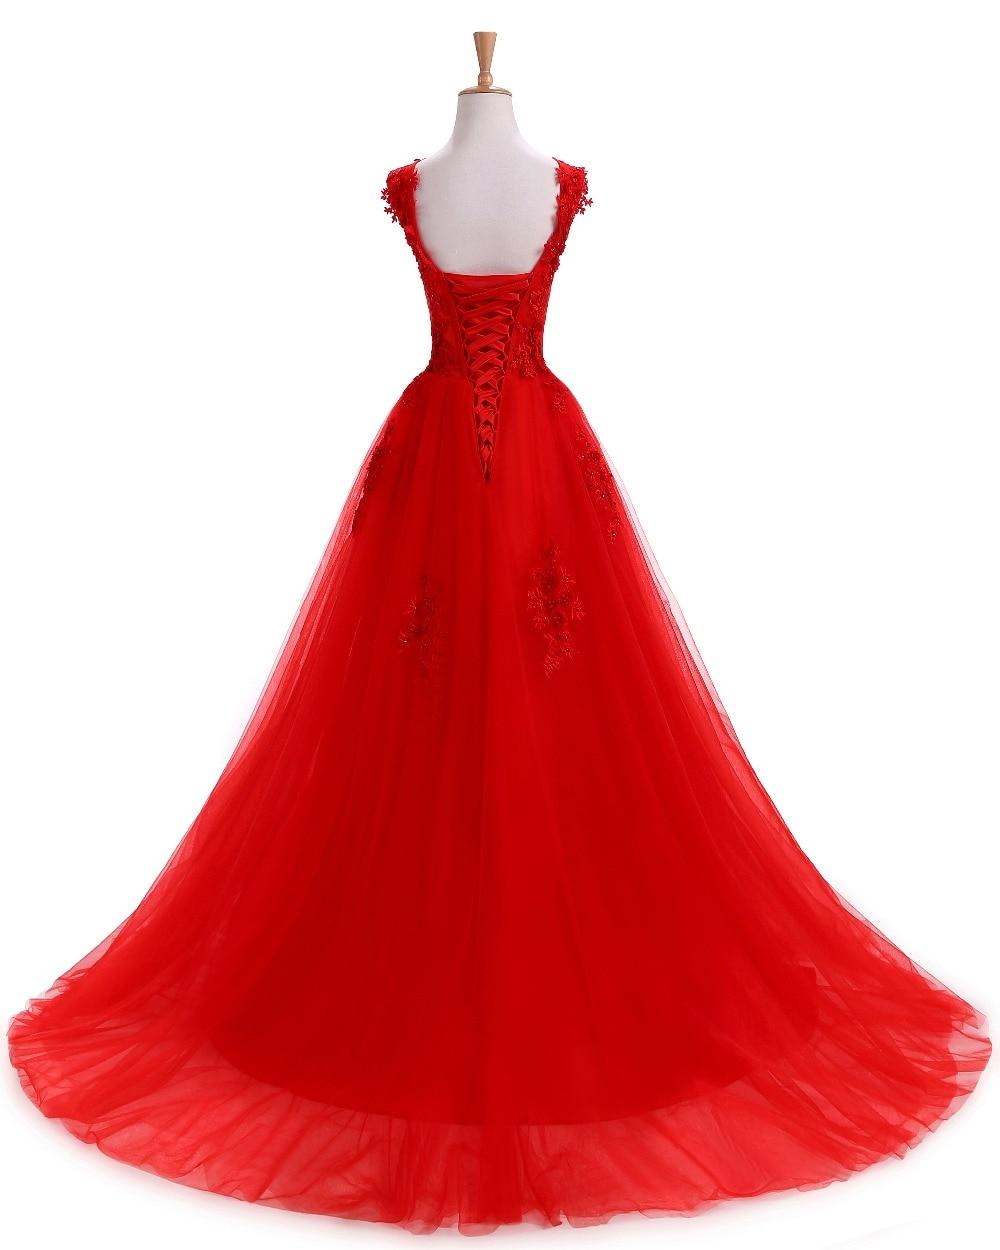 Haljina De Soiree Crvena večernja haljina Duga Plus veličina Til - Haljina za posebne prigode - Foto 2